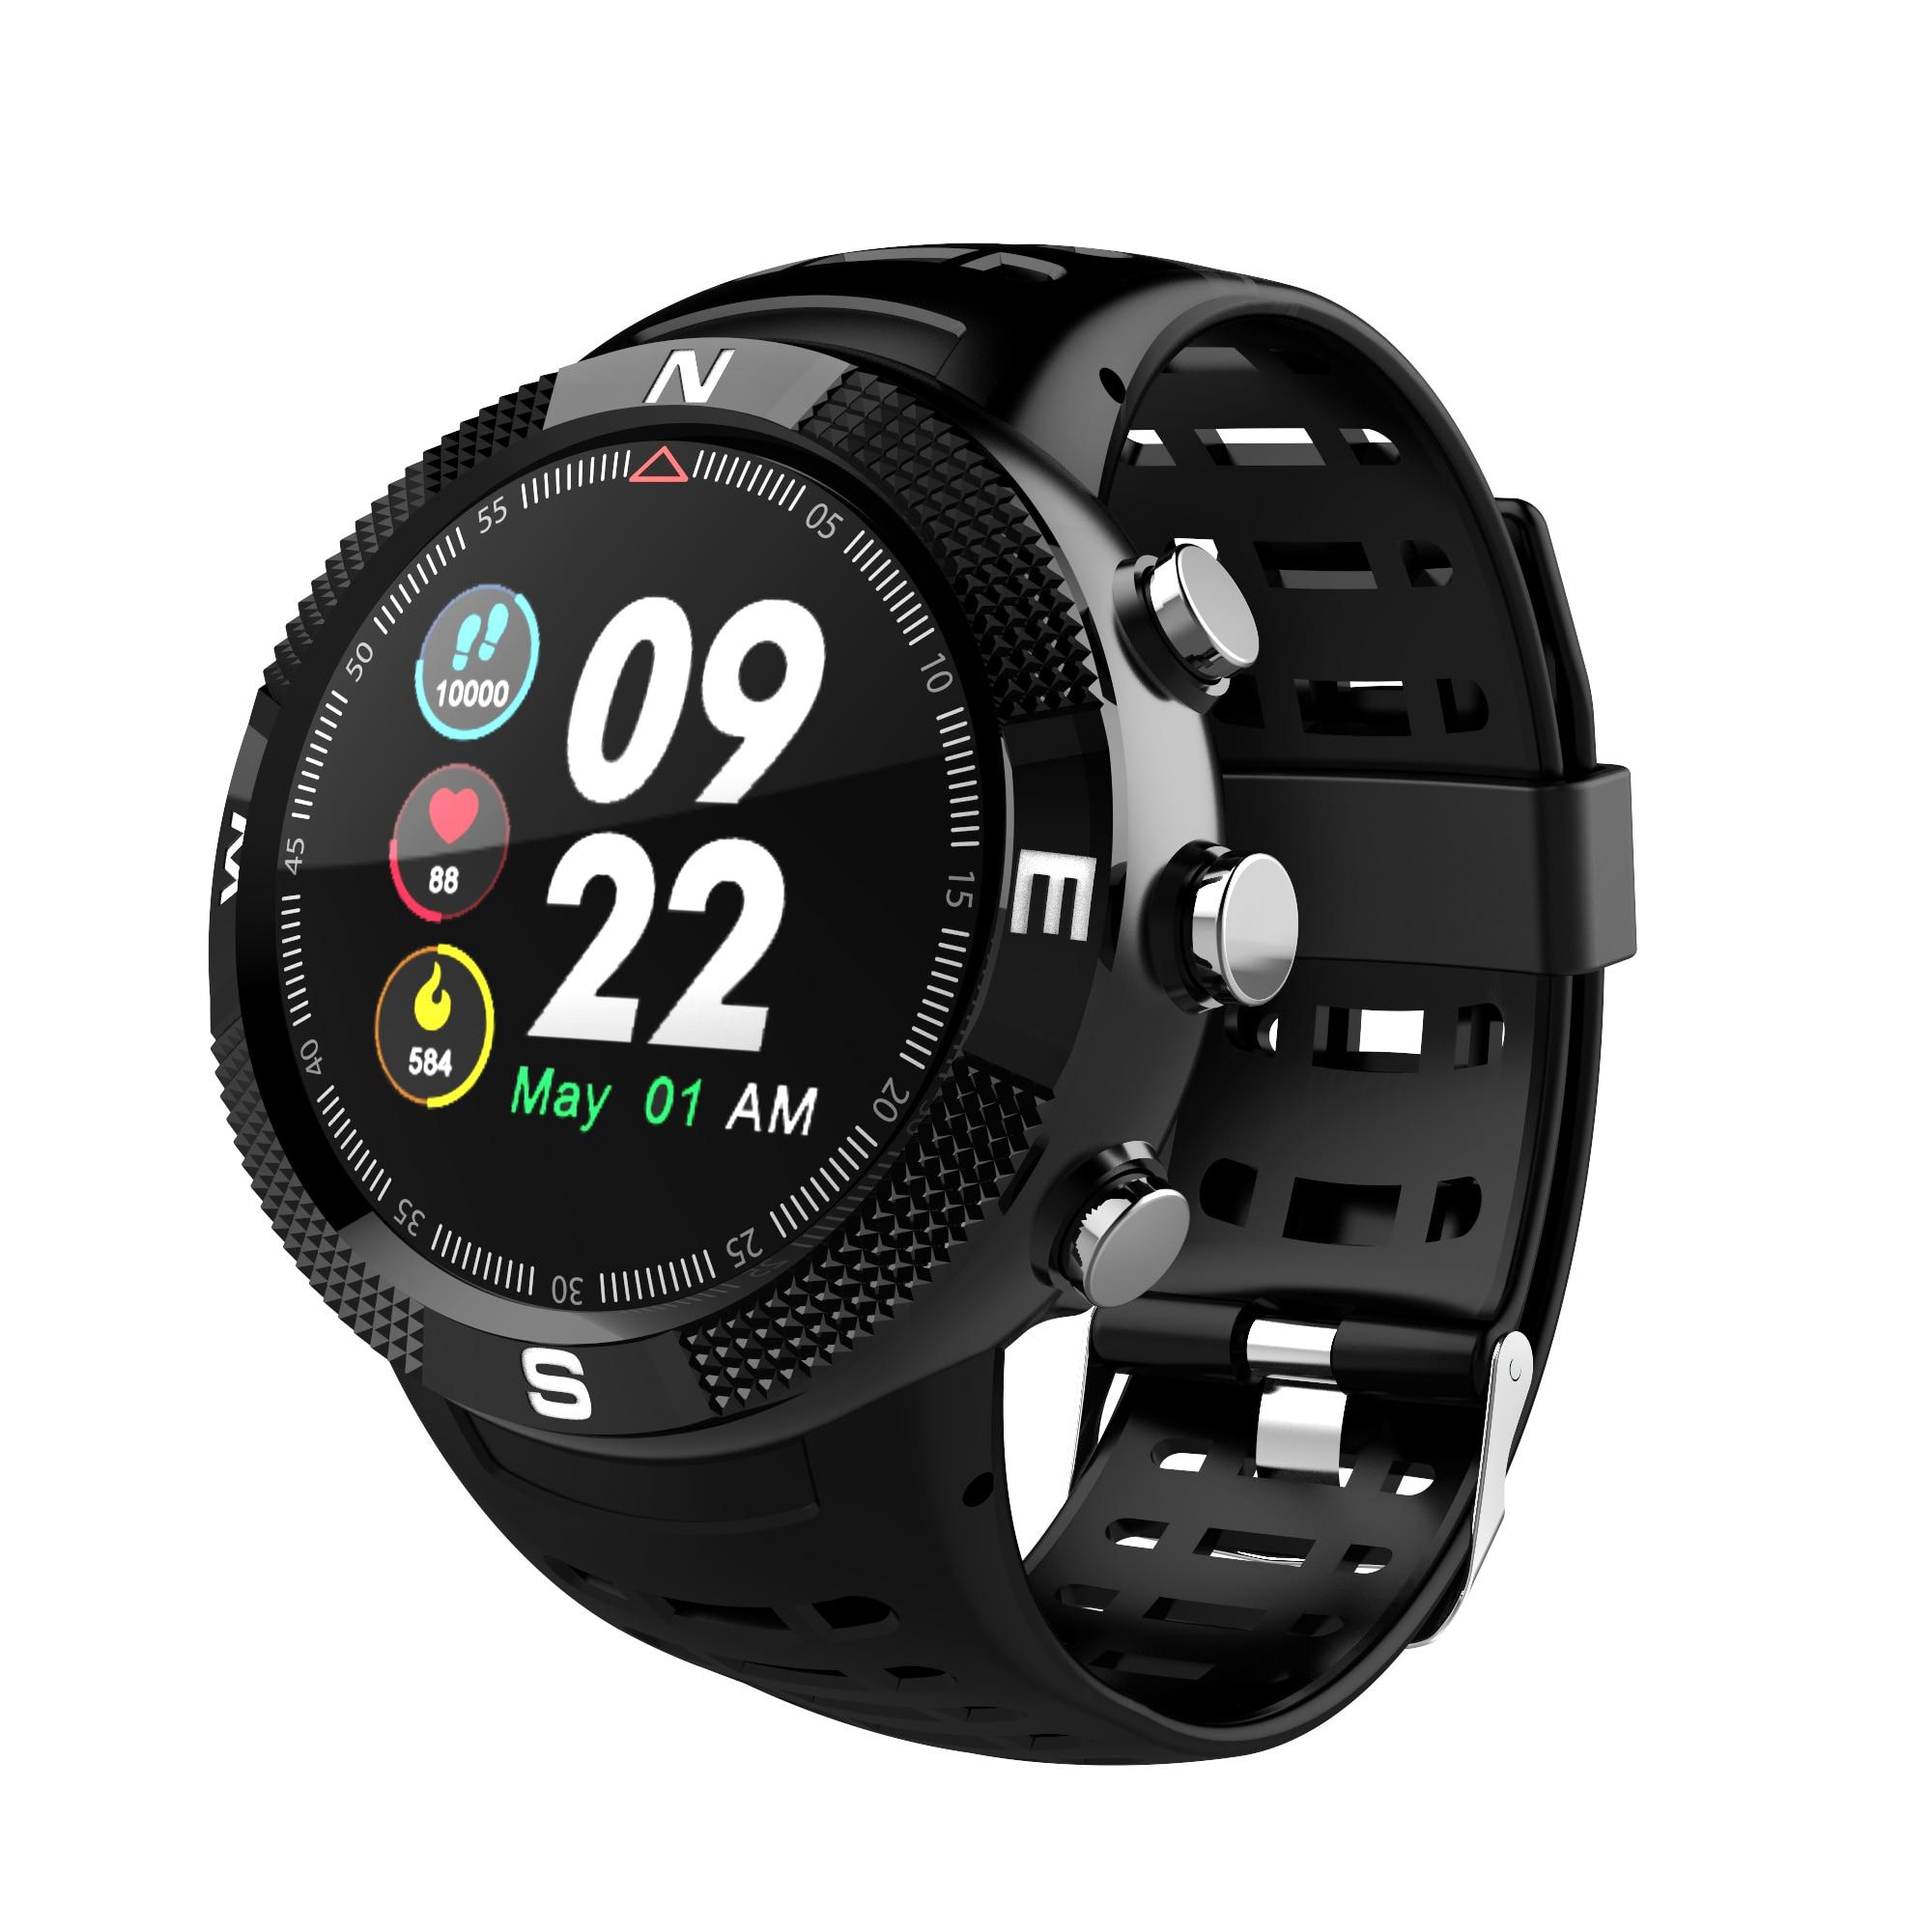 NO.1 F18 Bluetooth 4.2 IP68 Waterproof Call Message Reminder Pedometer Sleep Monitoring GPS Smartwatch Sports WatchNO.1 F18 Bluetooth 4.2 IP68 Waterproof Call Message Reminder Pedometer Sleep Monitoring GPS Smartwatch Sports Watch